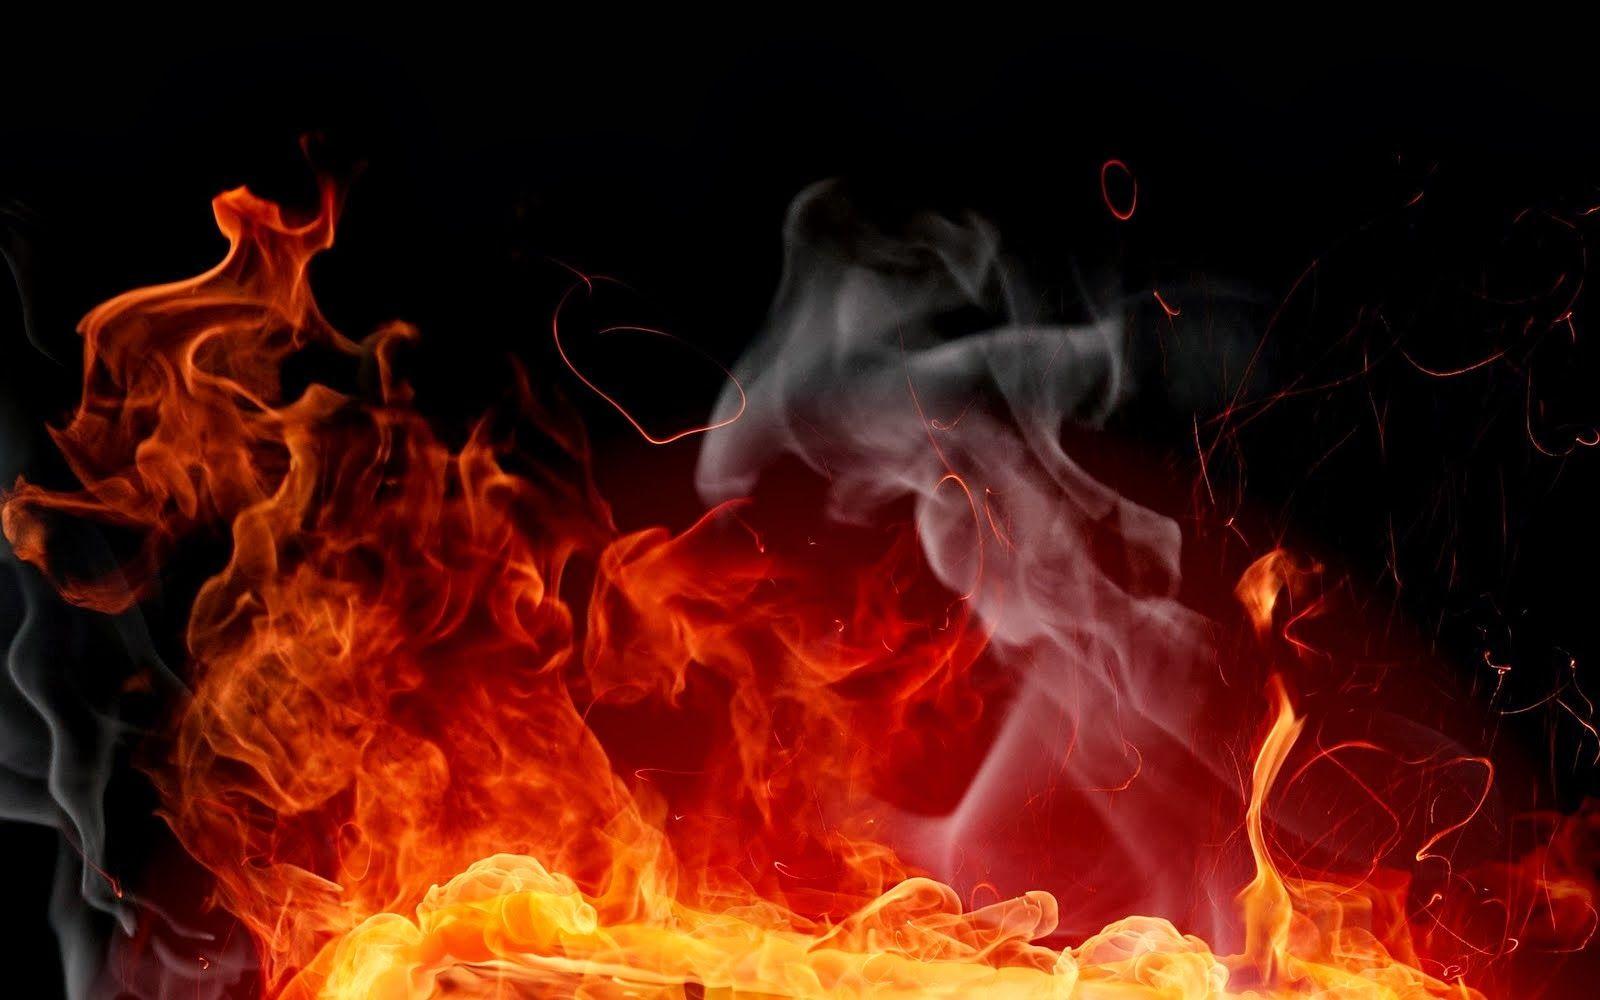 Best Top Desktop Dark Black Fire Wallpapers Hd Fire Wallpaper Picture 2 Jpg 1600 1000 Red And Black Wallpaper Fire Image Qhd Wallpaper